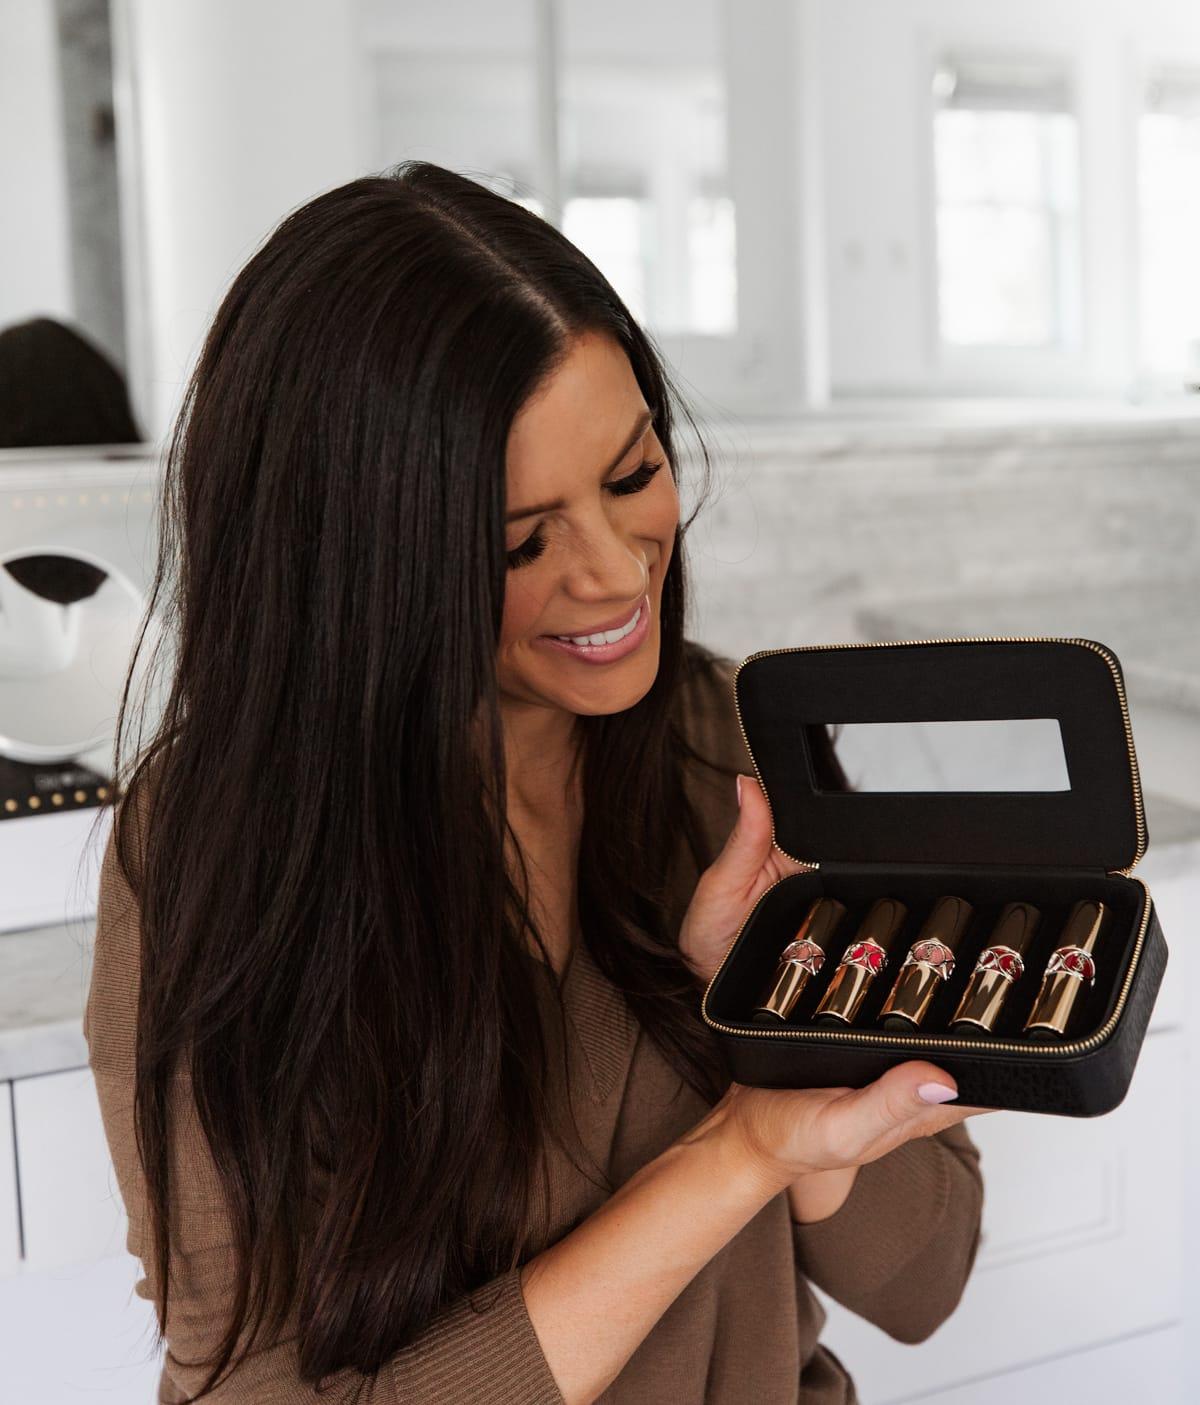 YSL lipstick nordstrom beauty gifts